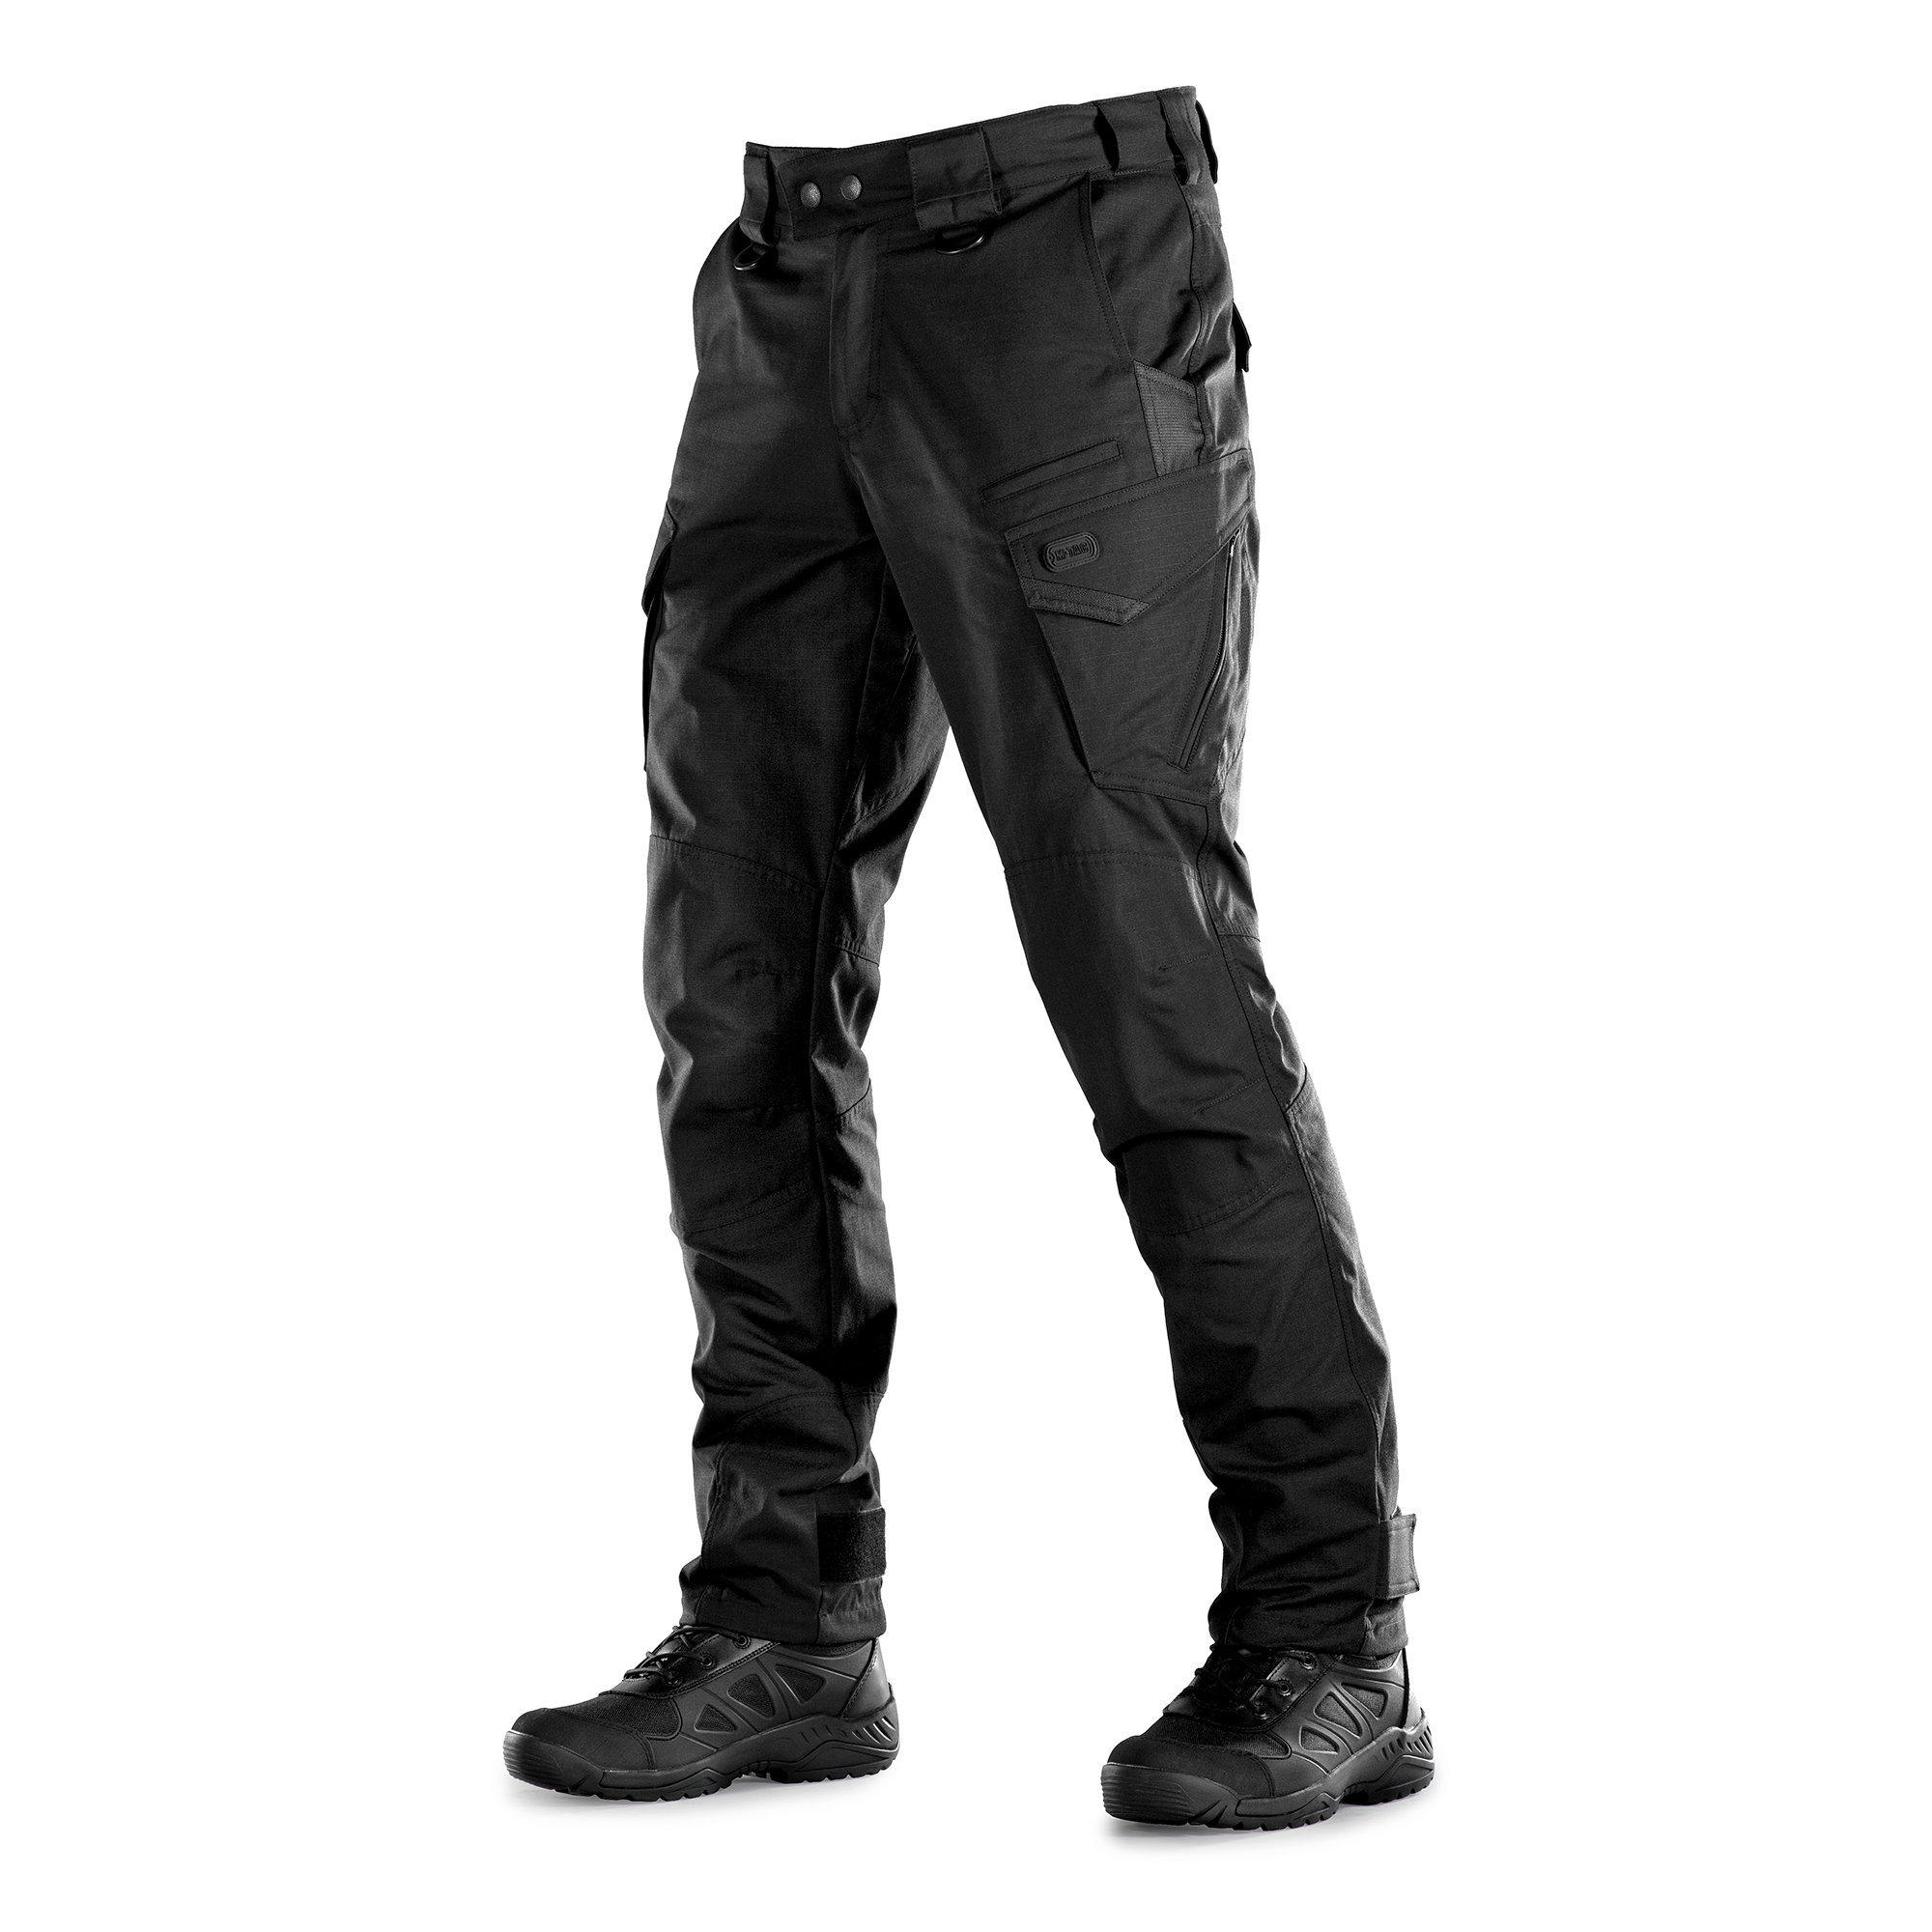 Aggressor Elite Tactical Pants Men Black NYCO with Cargo Pockets (Black, XL/L)